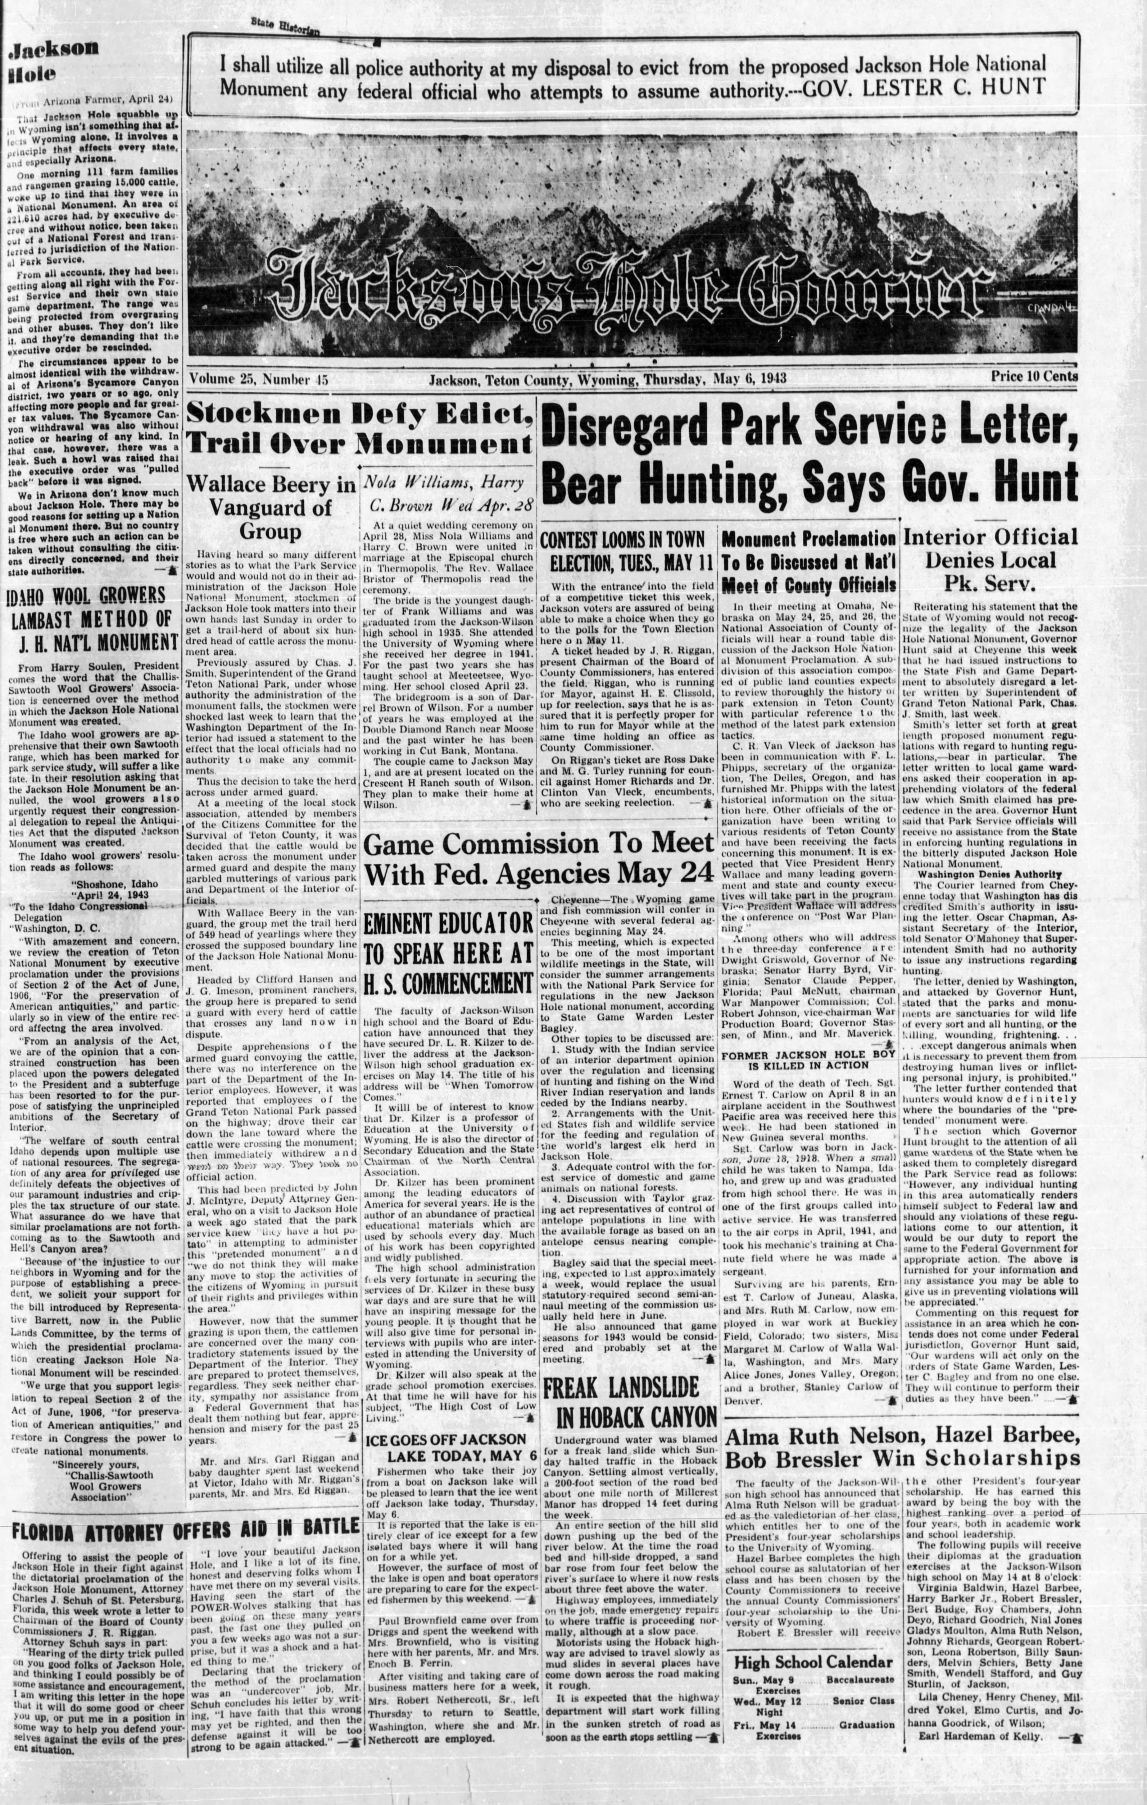 Jackson Hole digital news archives